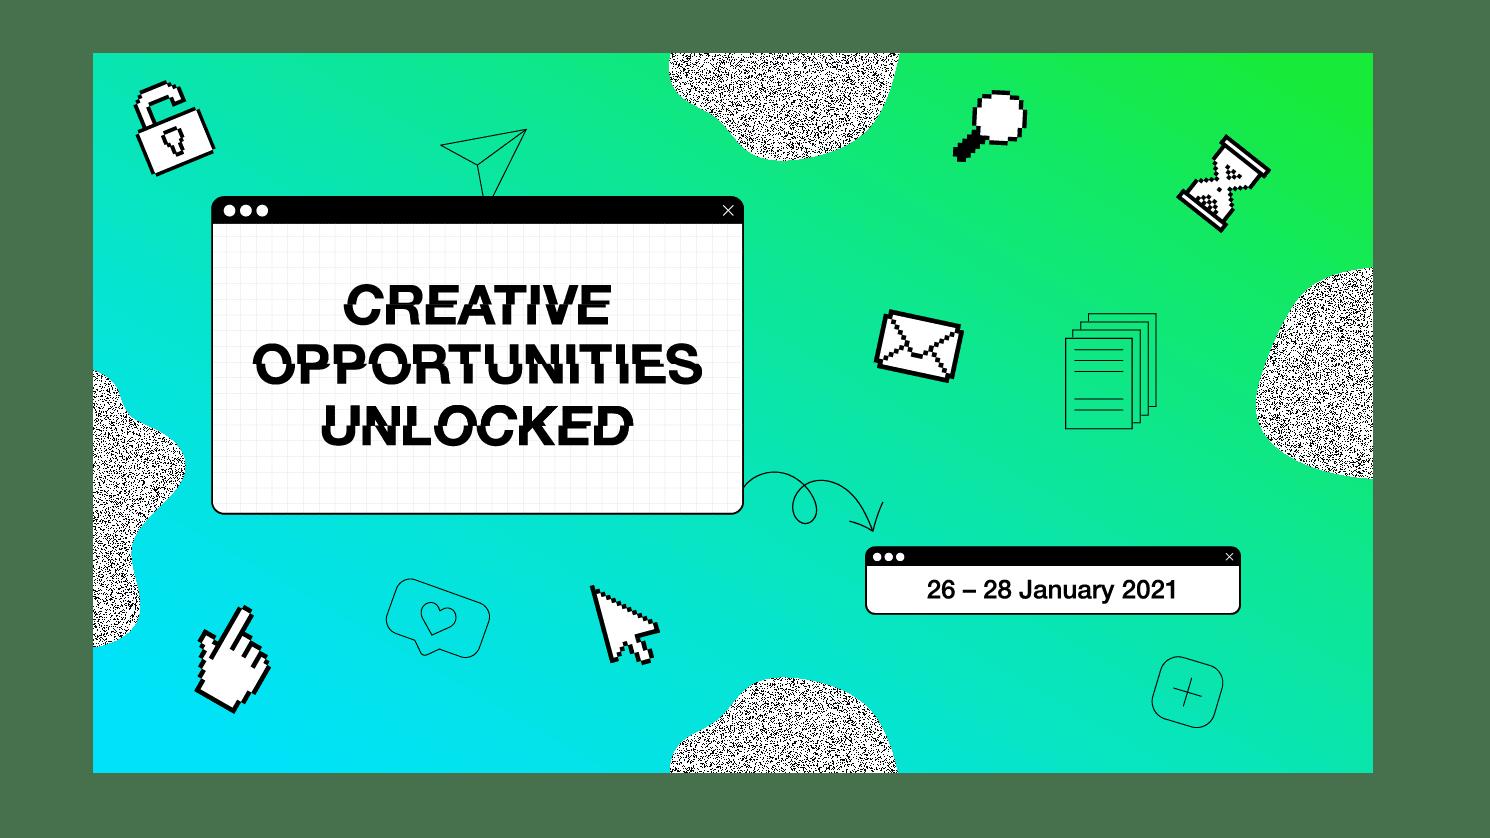 Creative Opportunities Unlocked - 26-28 January 2021